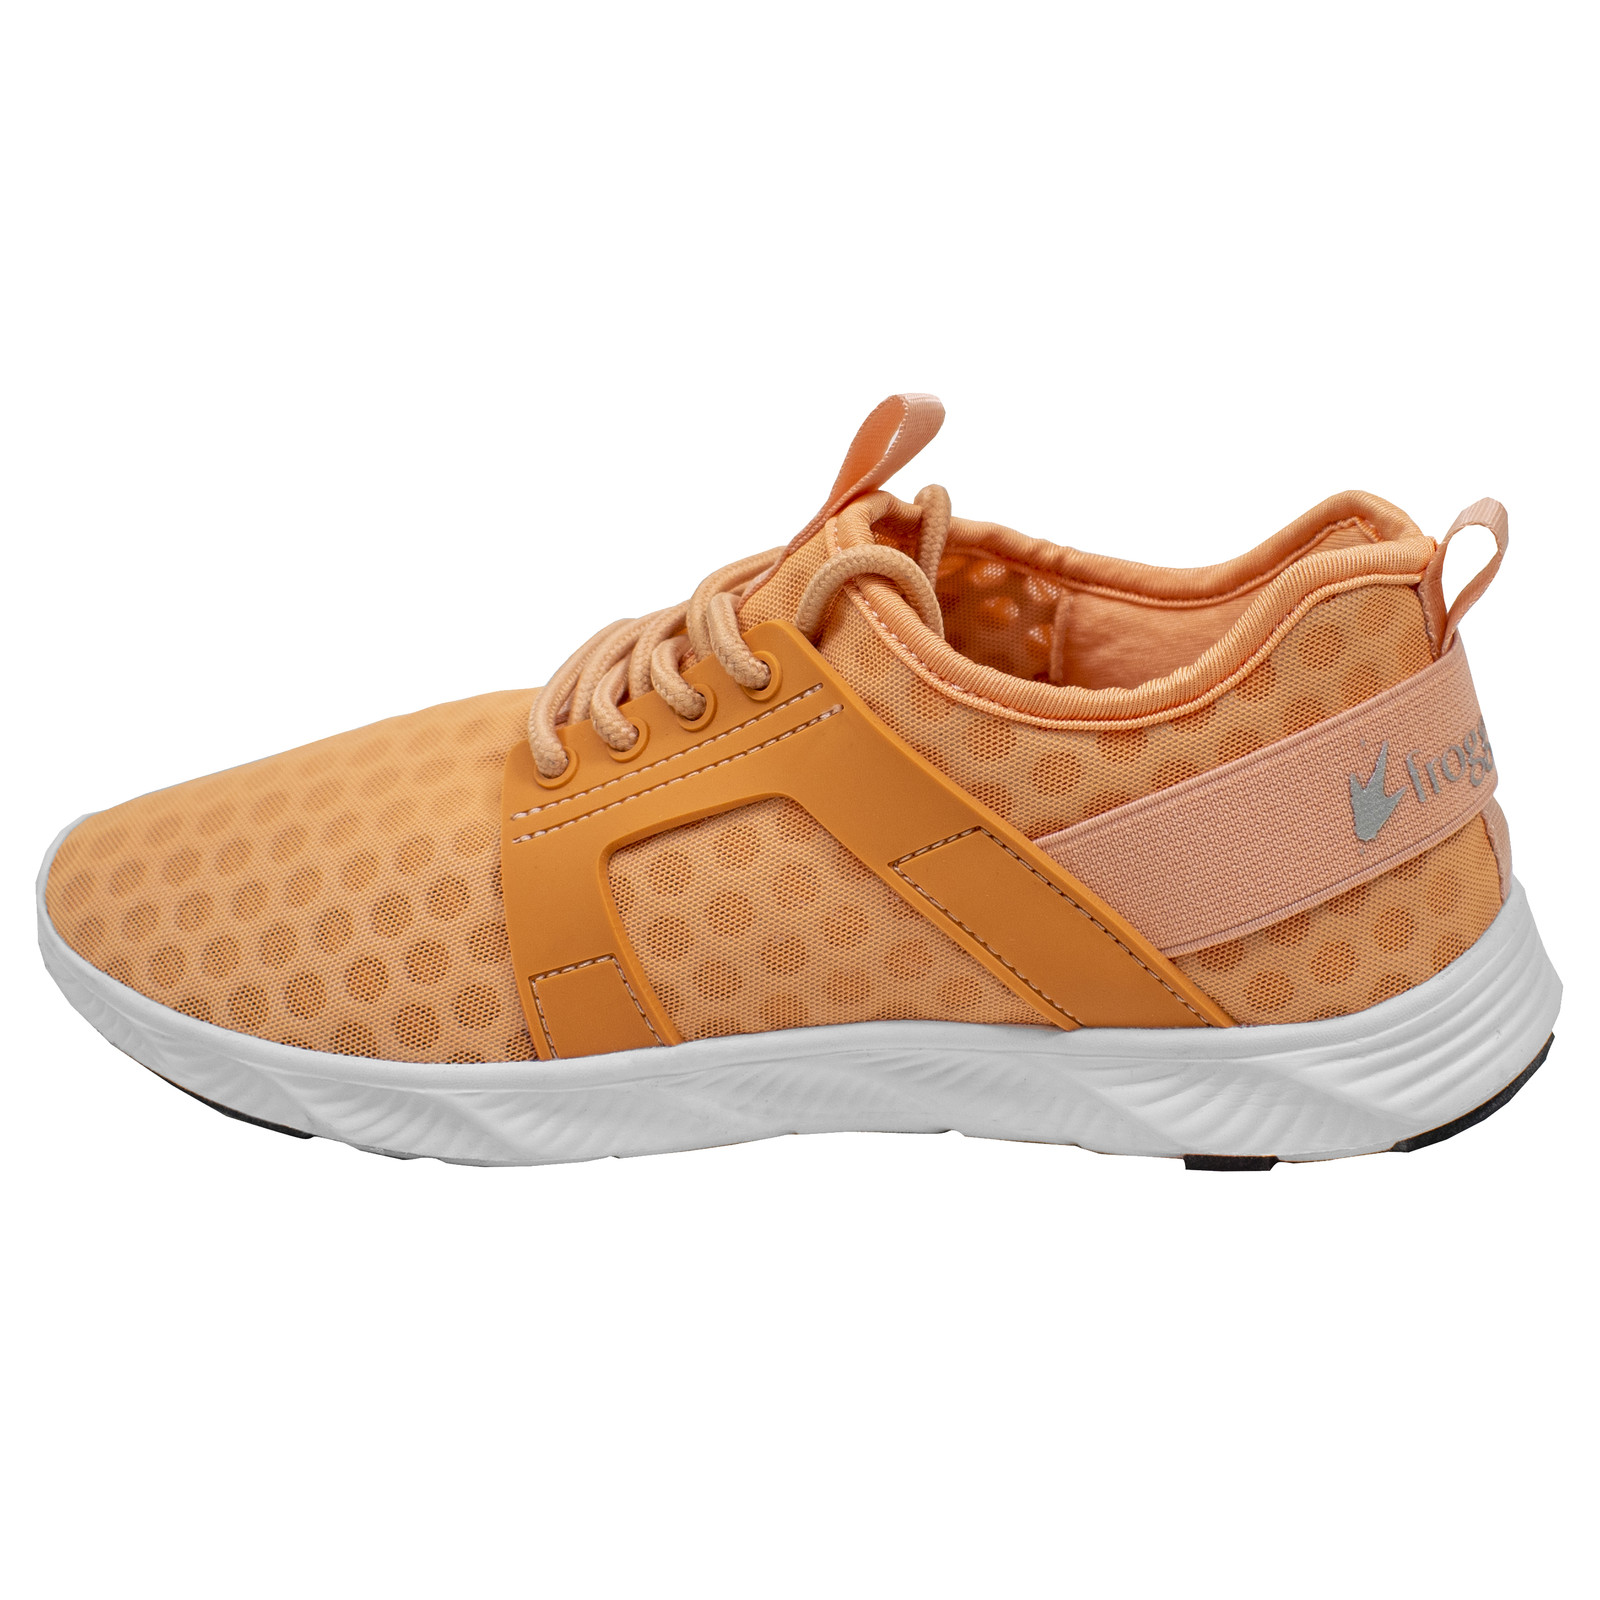 Women's Shortfin XTR Shoe Blush-large